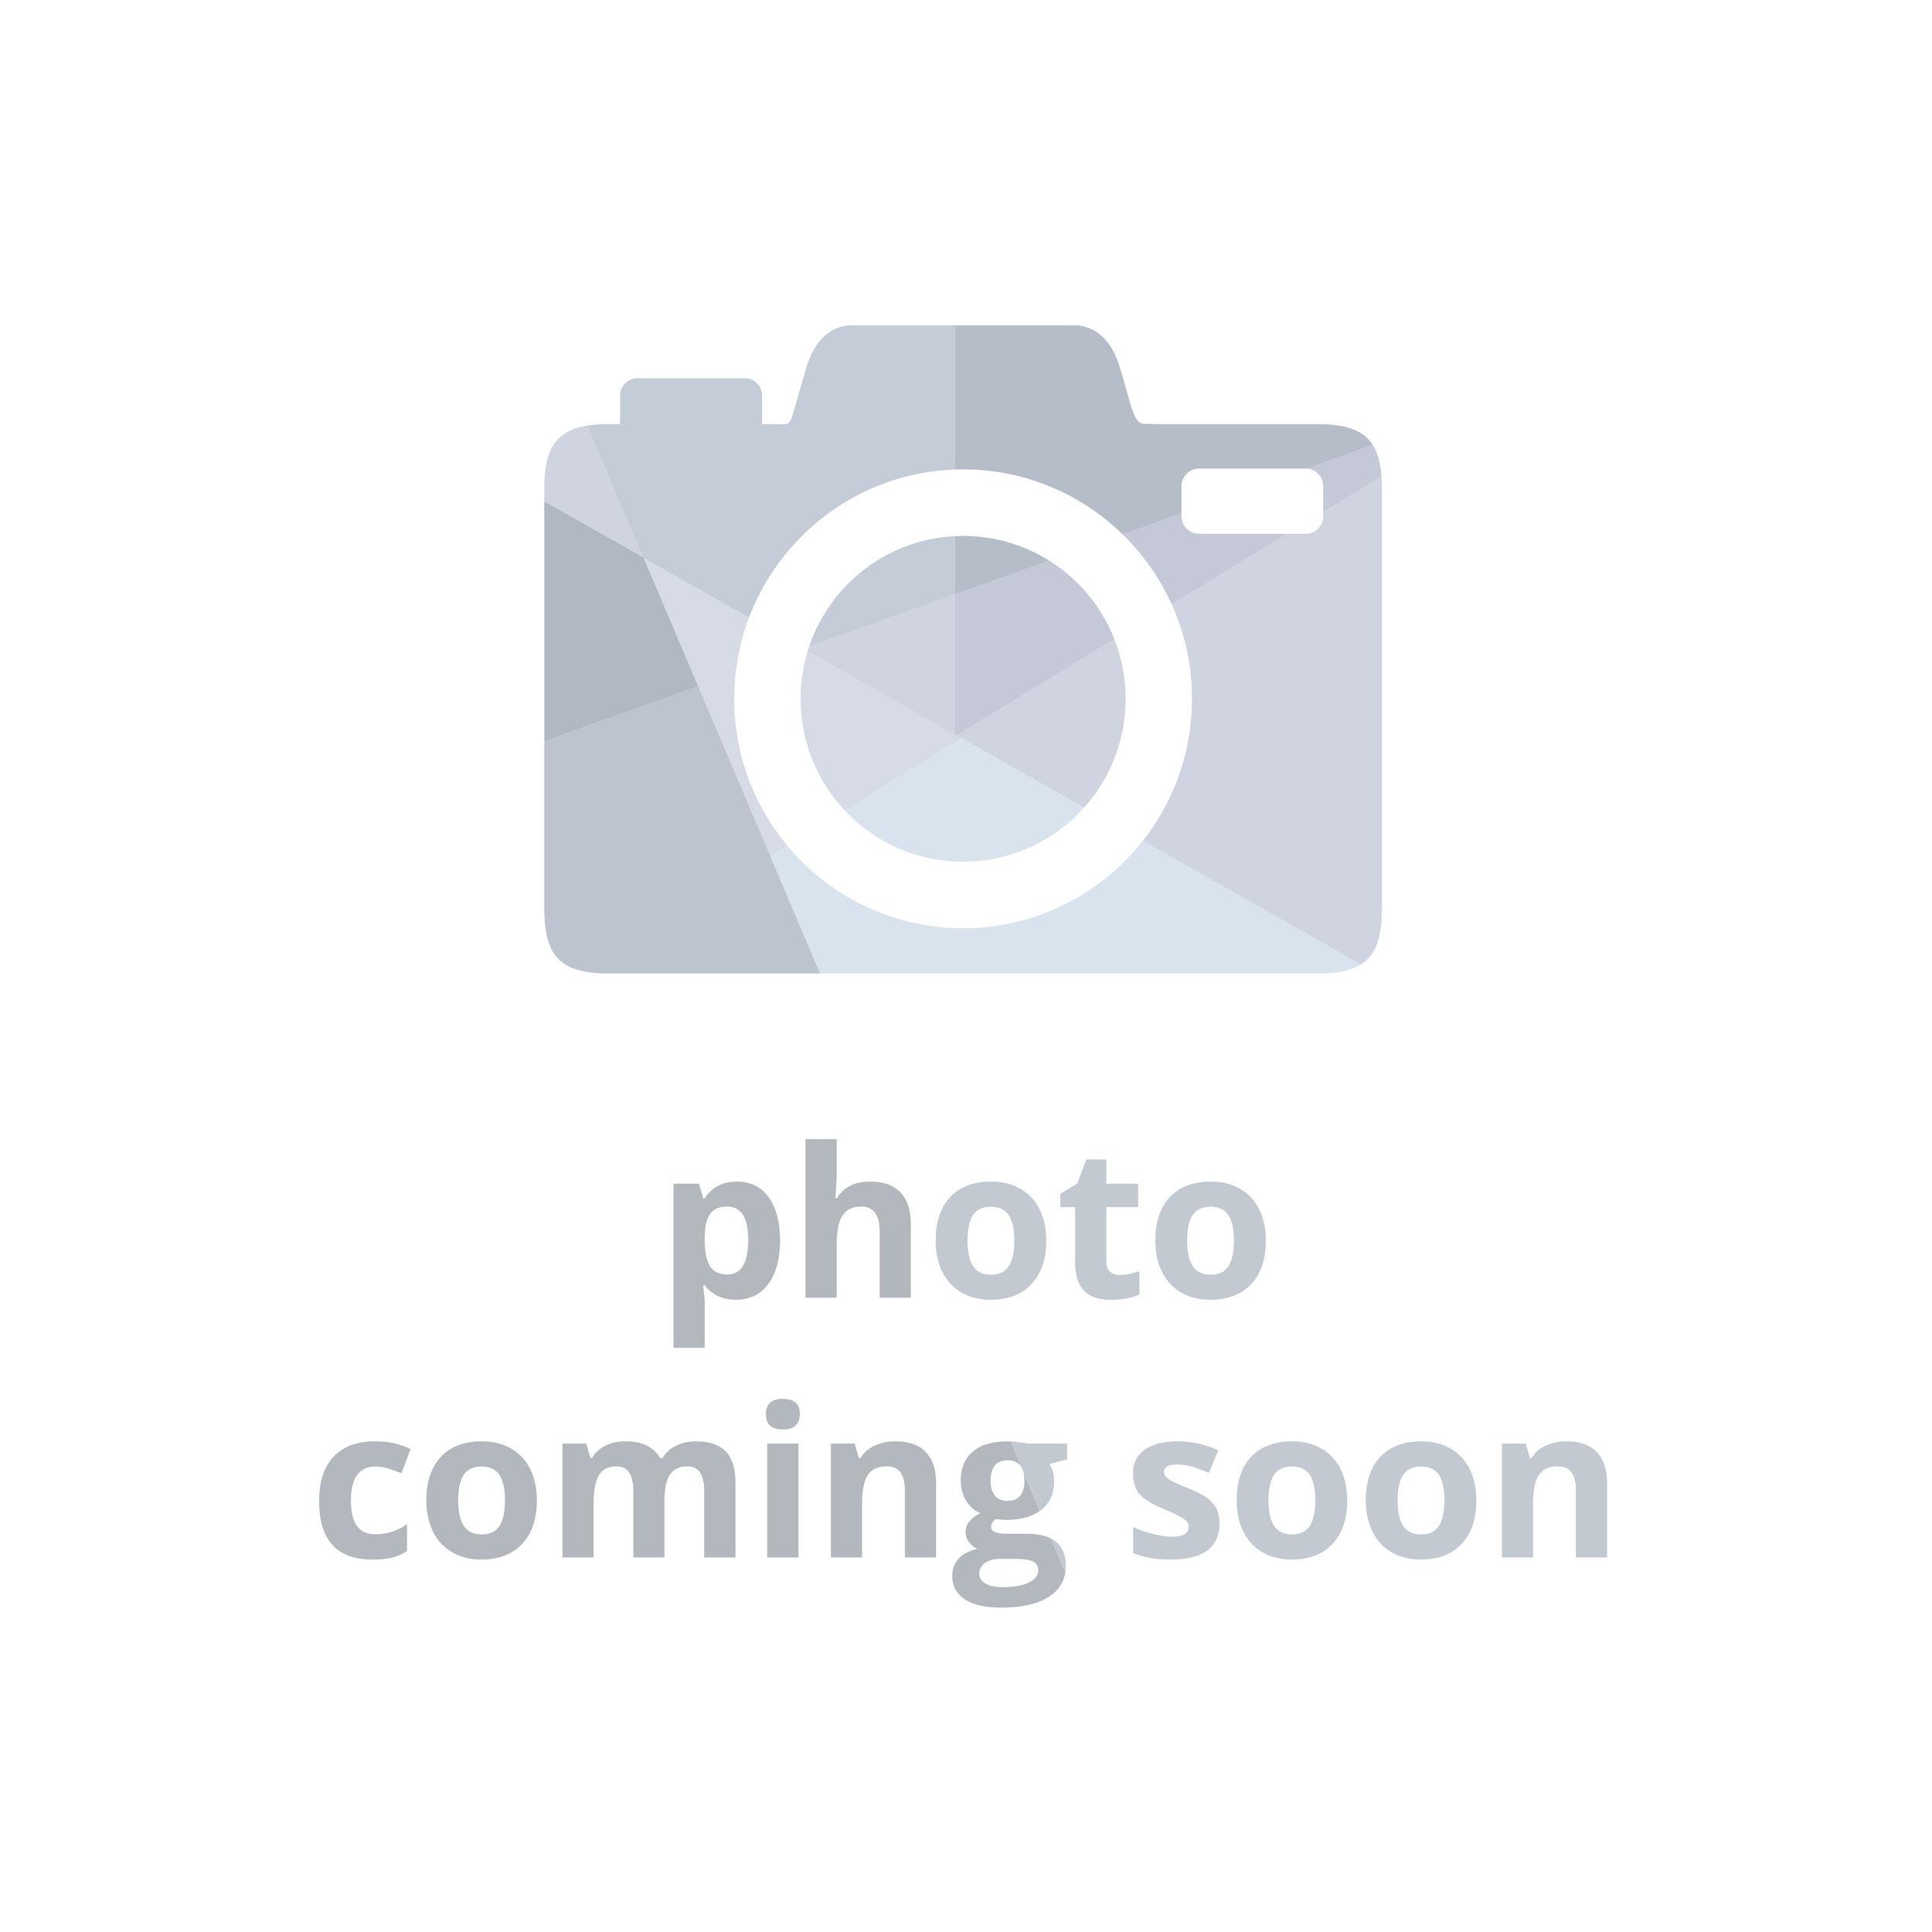 shutterstock_161251868.jpg